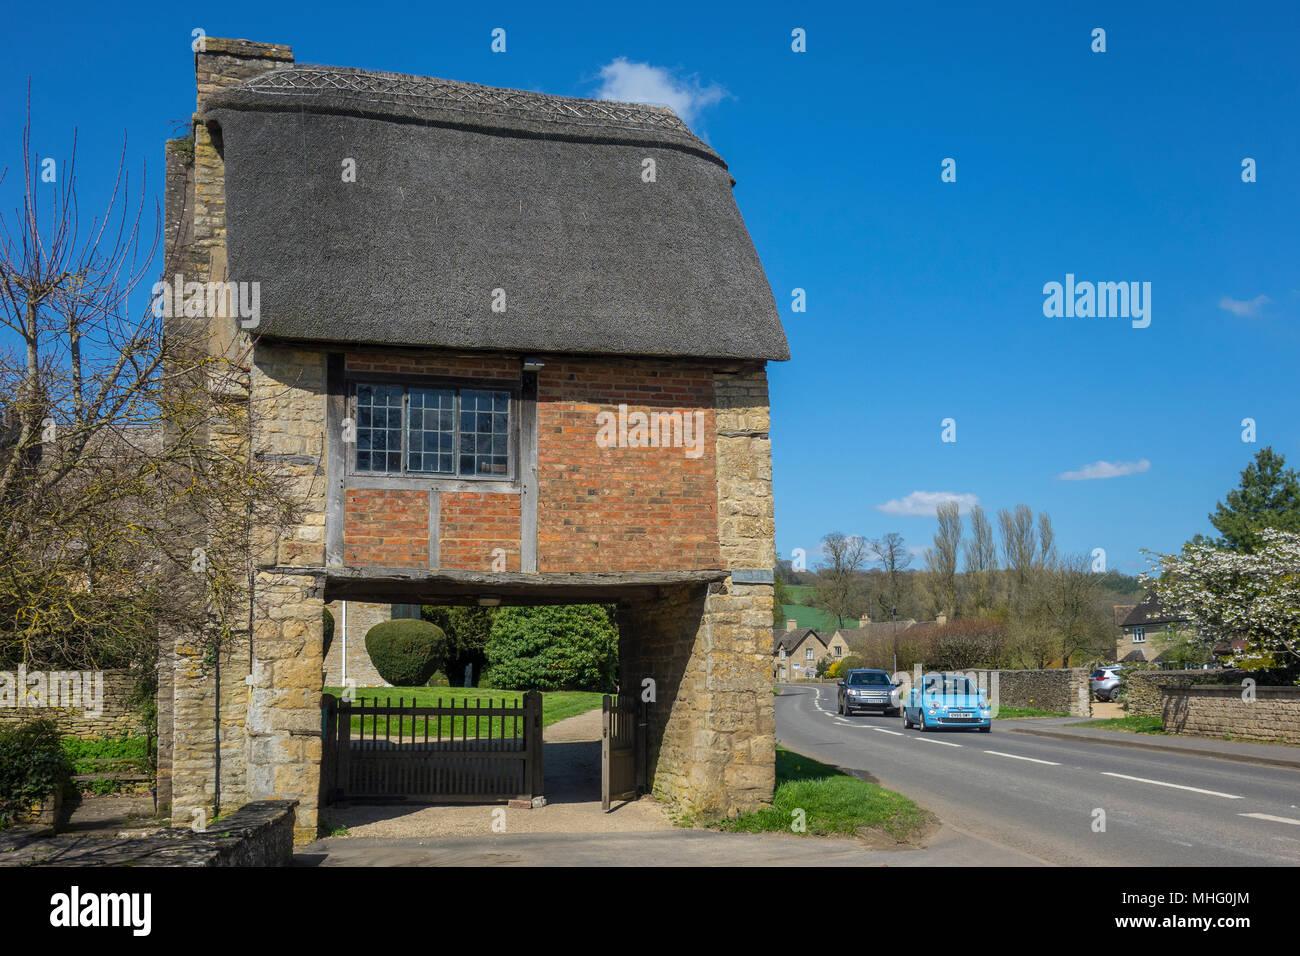 England, Warwickshire, Long Compton church Lych gate & road - Stock Image